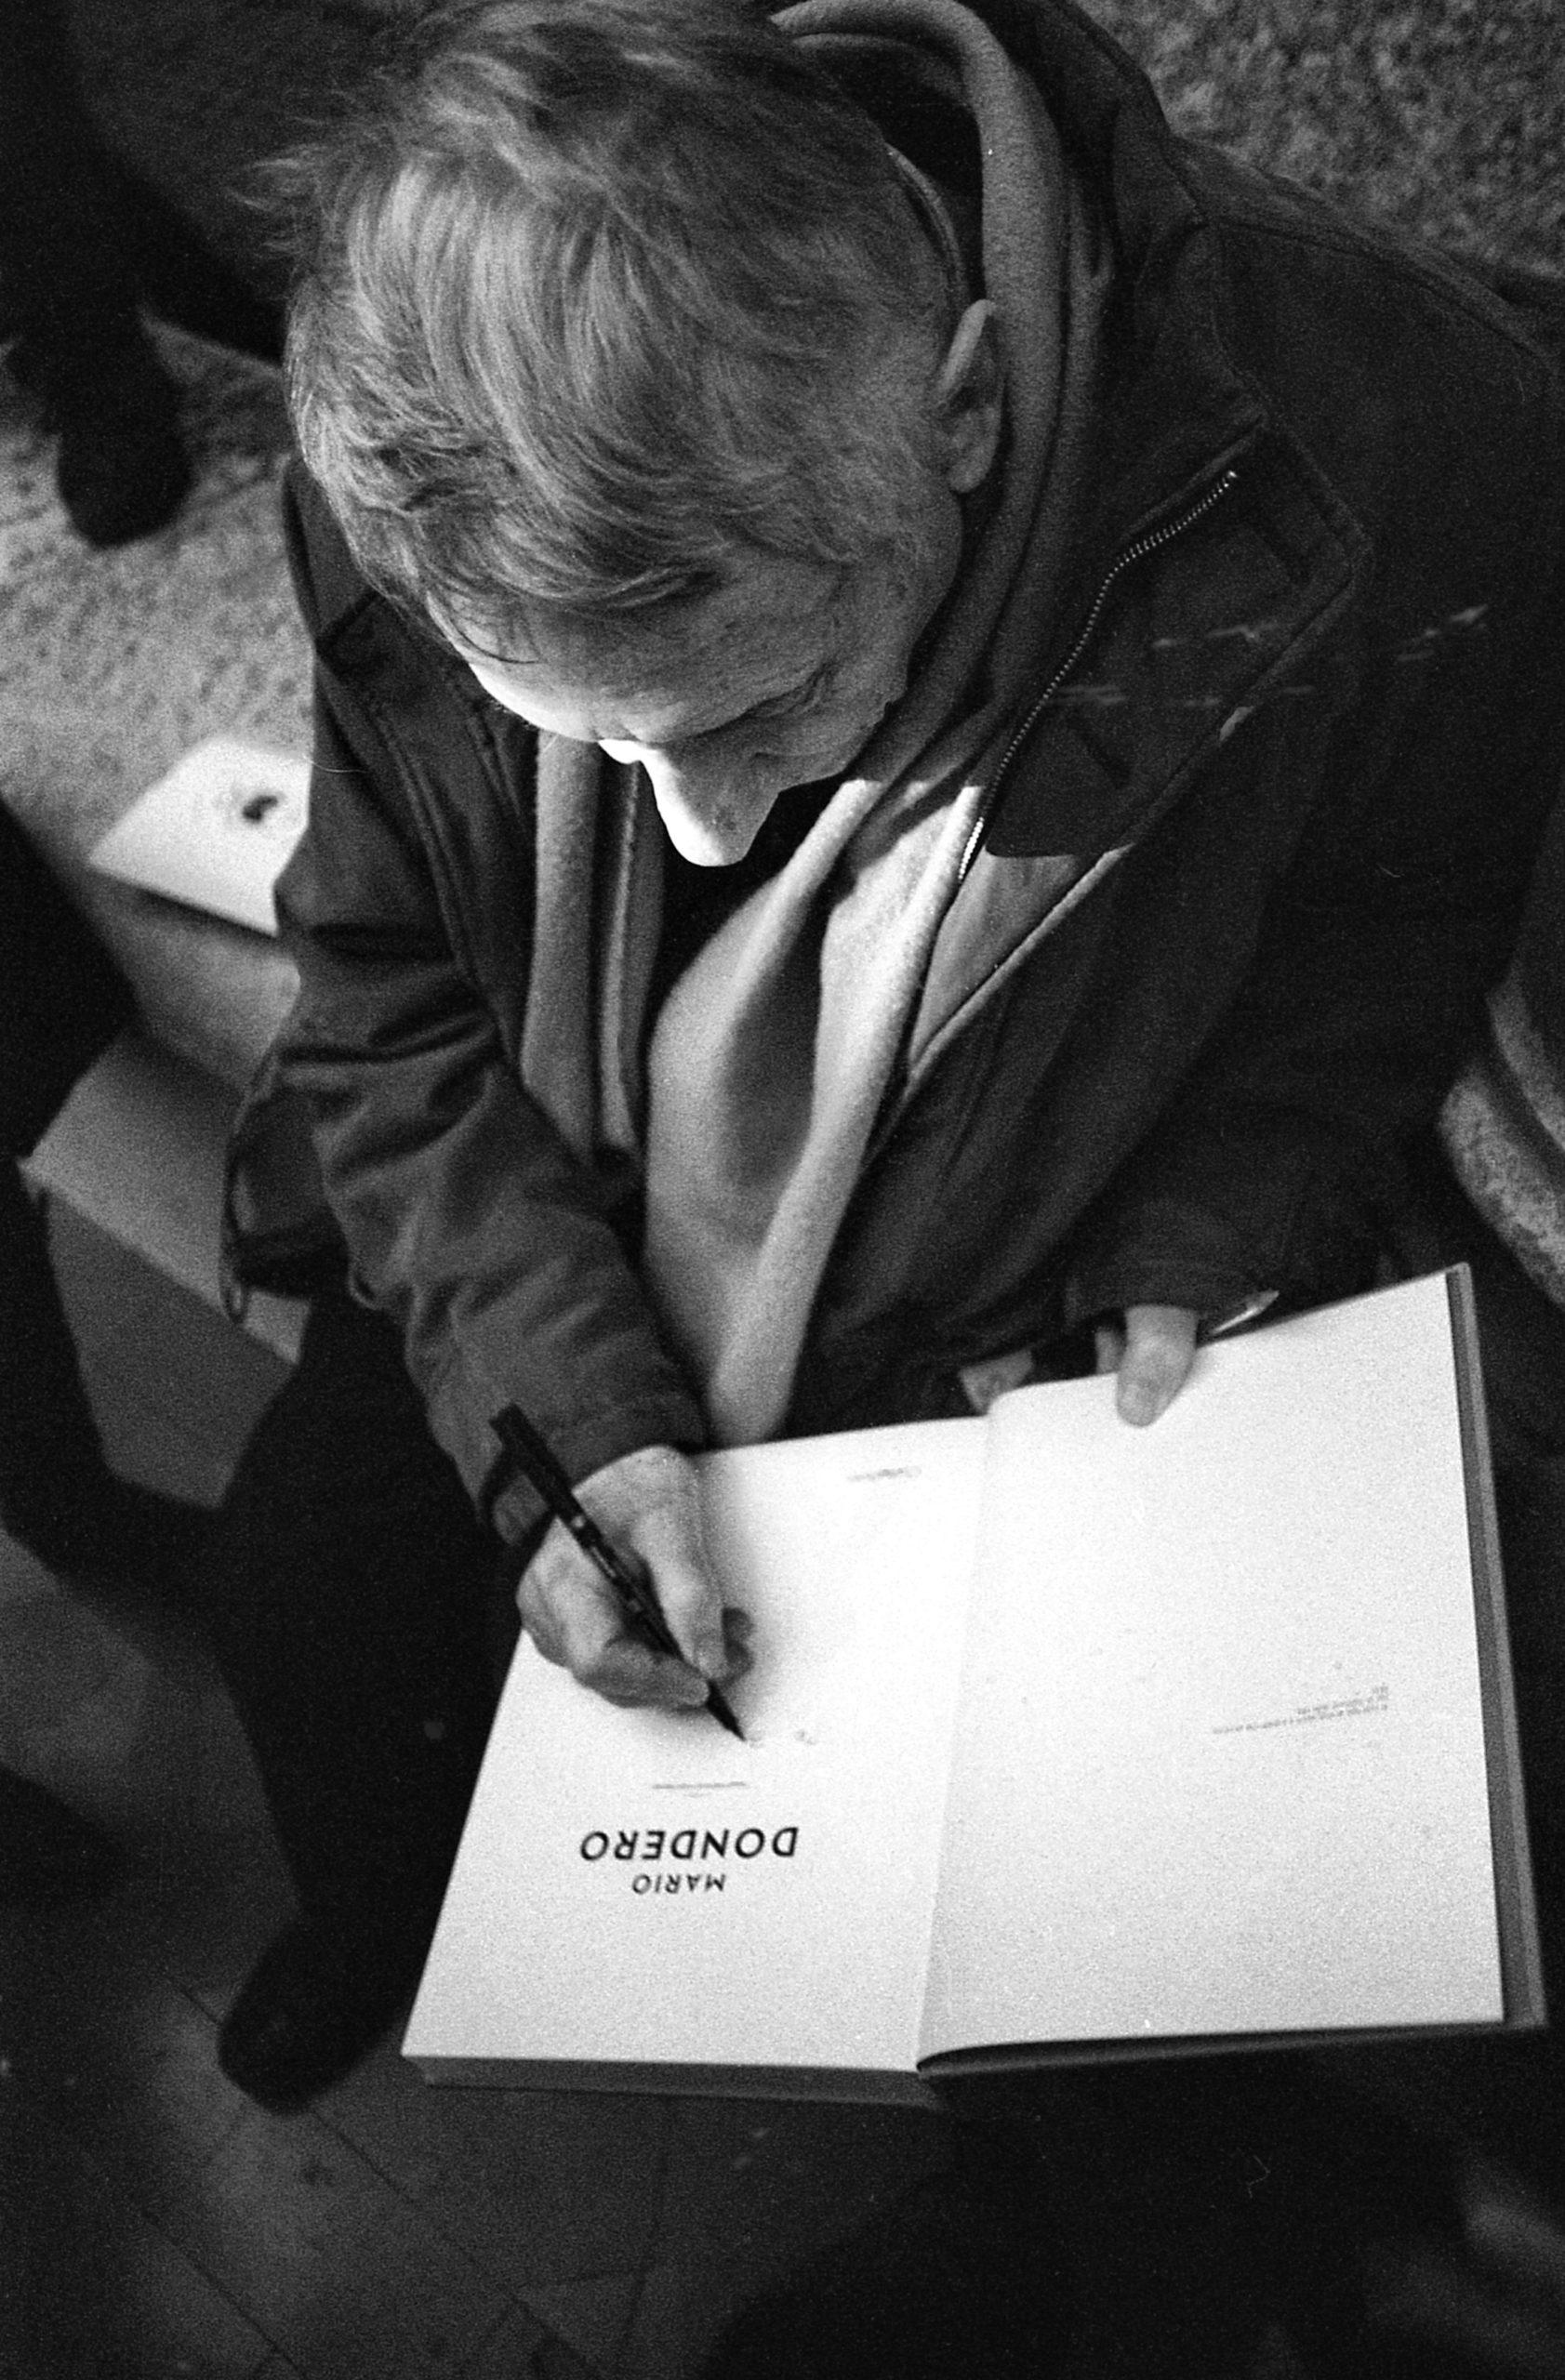 Mario Dondero - Porthos Edizioni